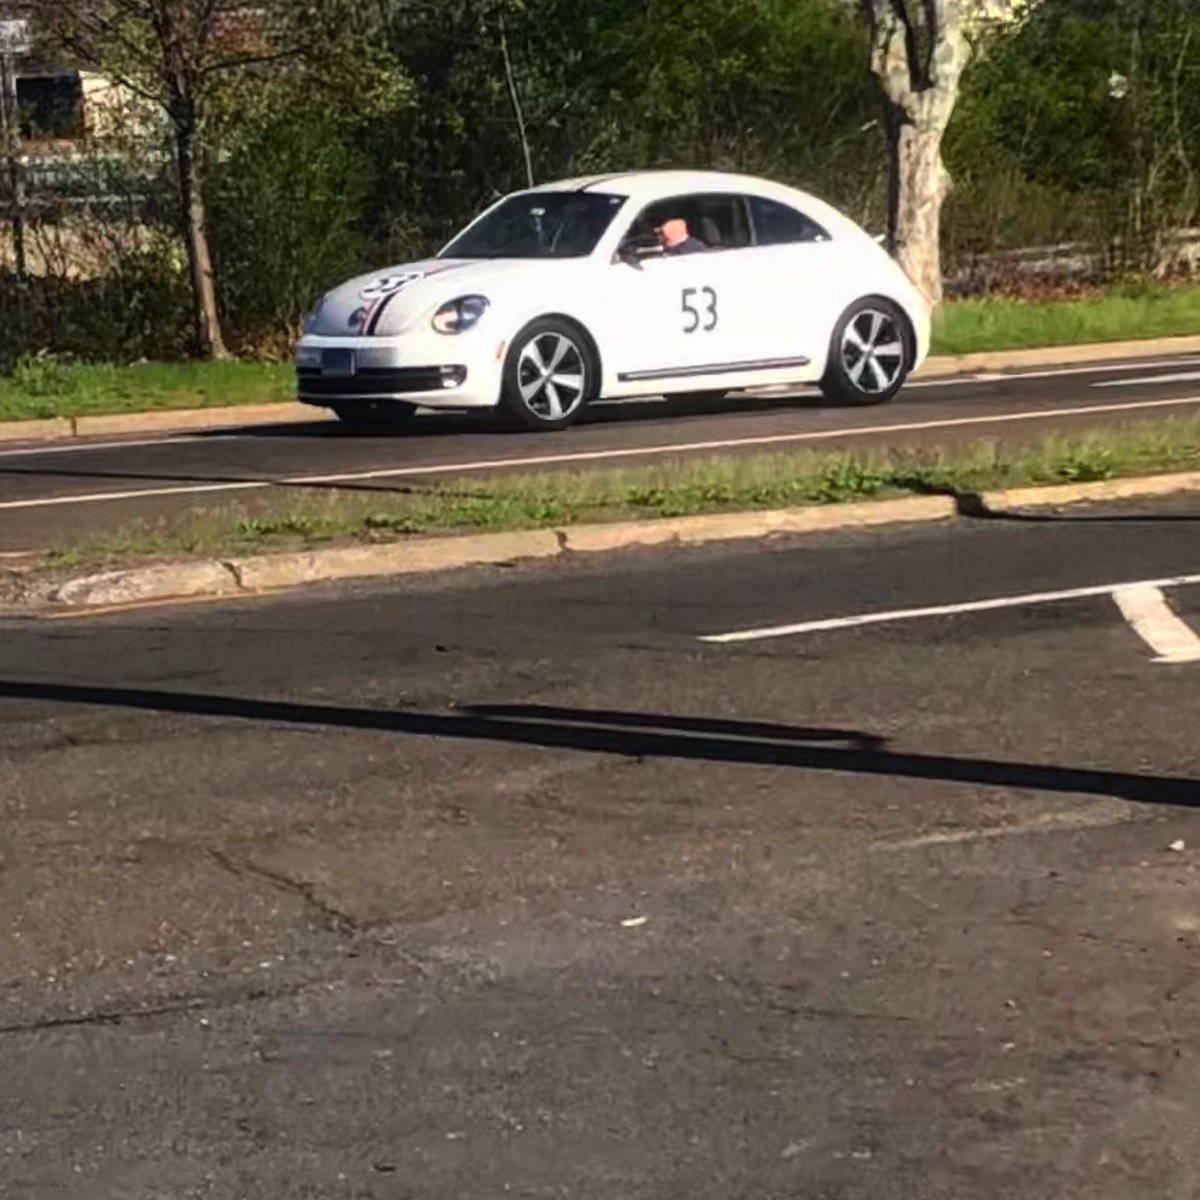 Found a VW Beetle on my way home. Anybody a fan of Hurbie? 😆 @VW